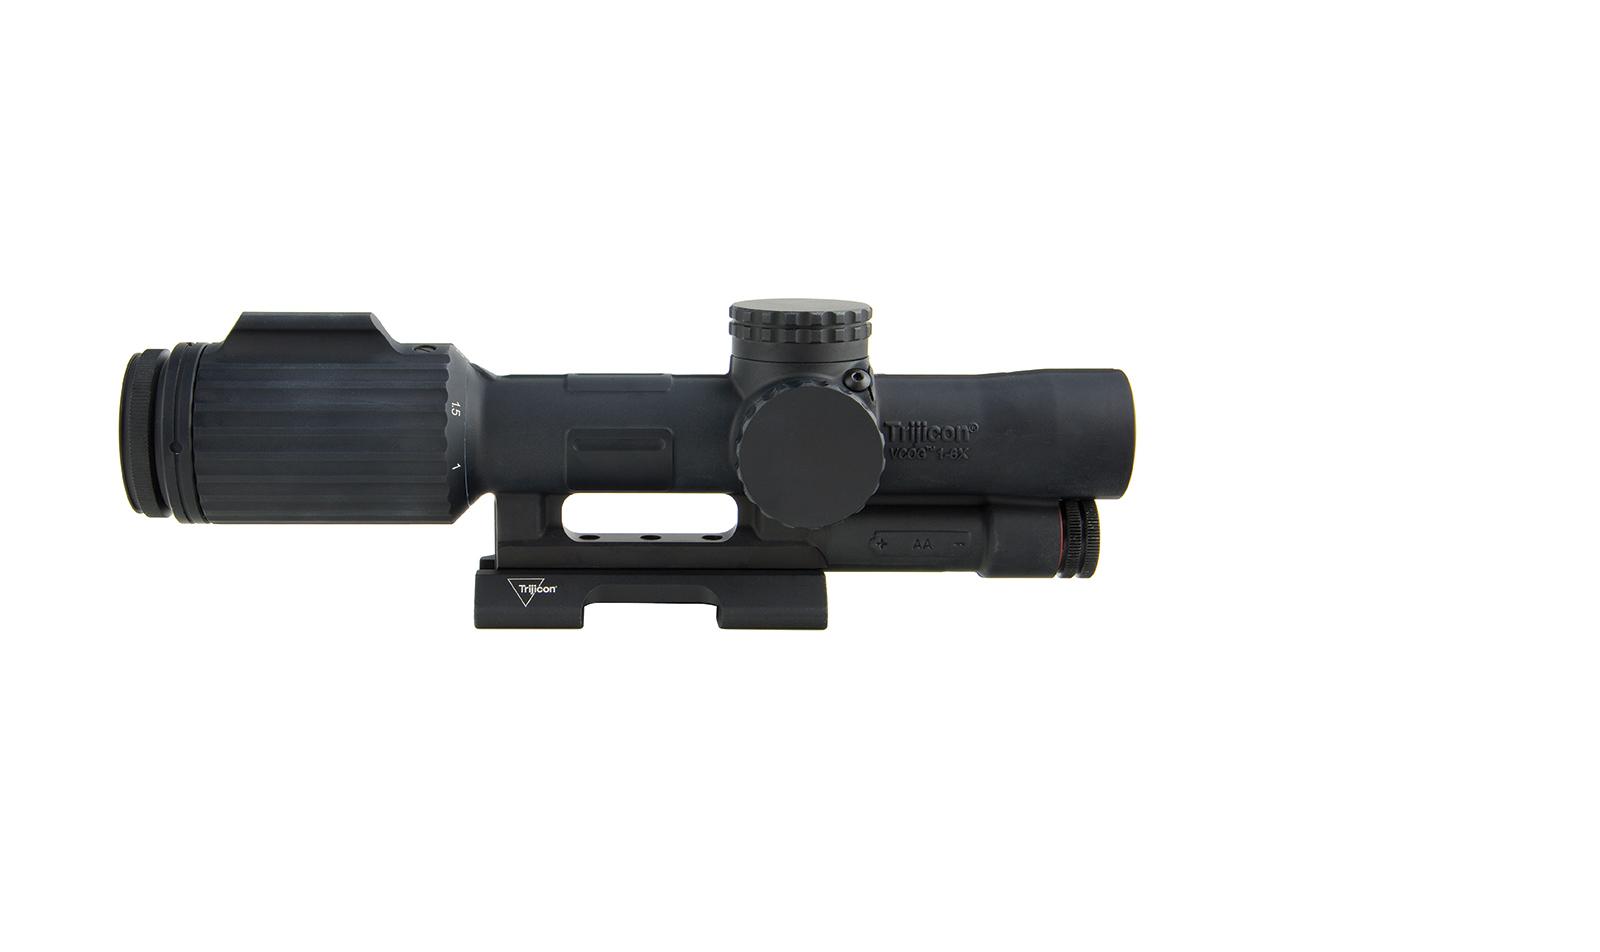 VC16-C-1600051 angle 6